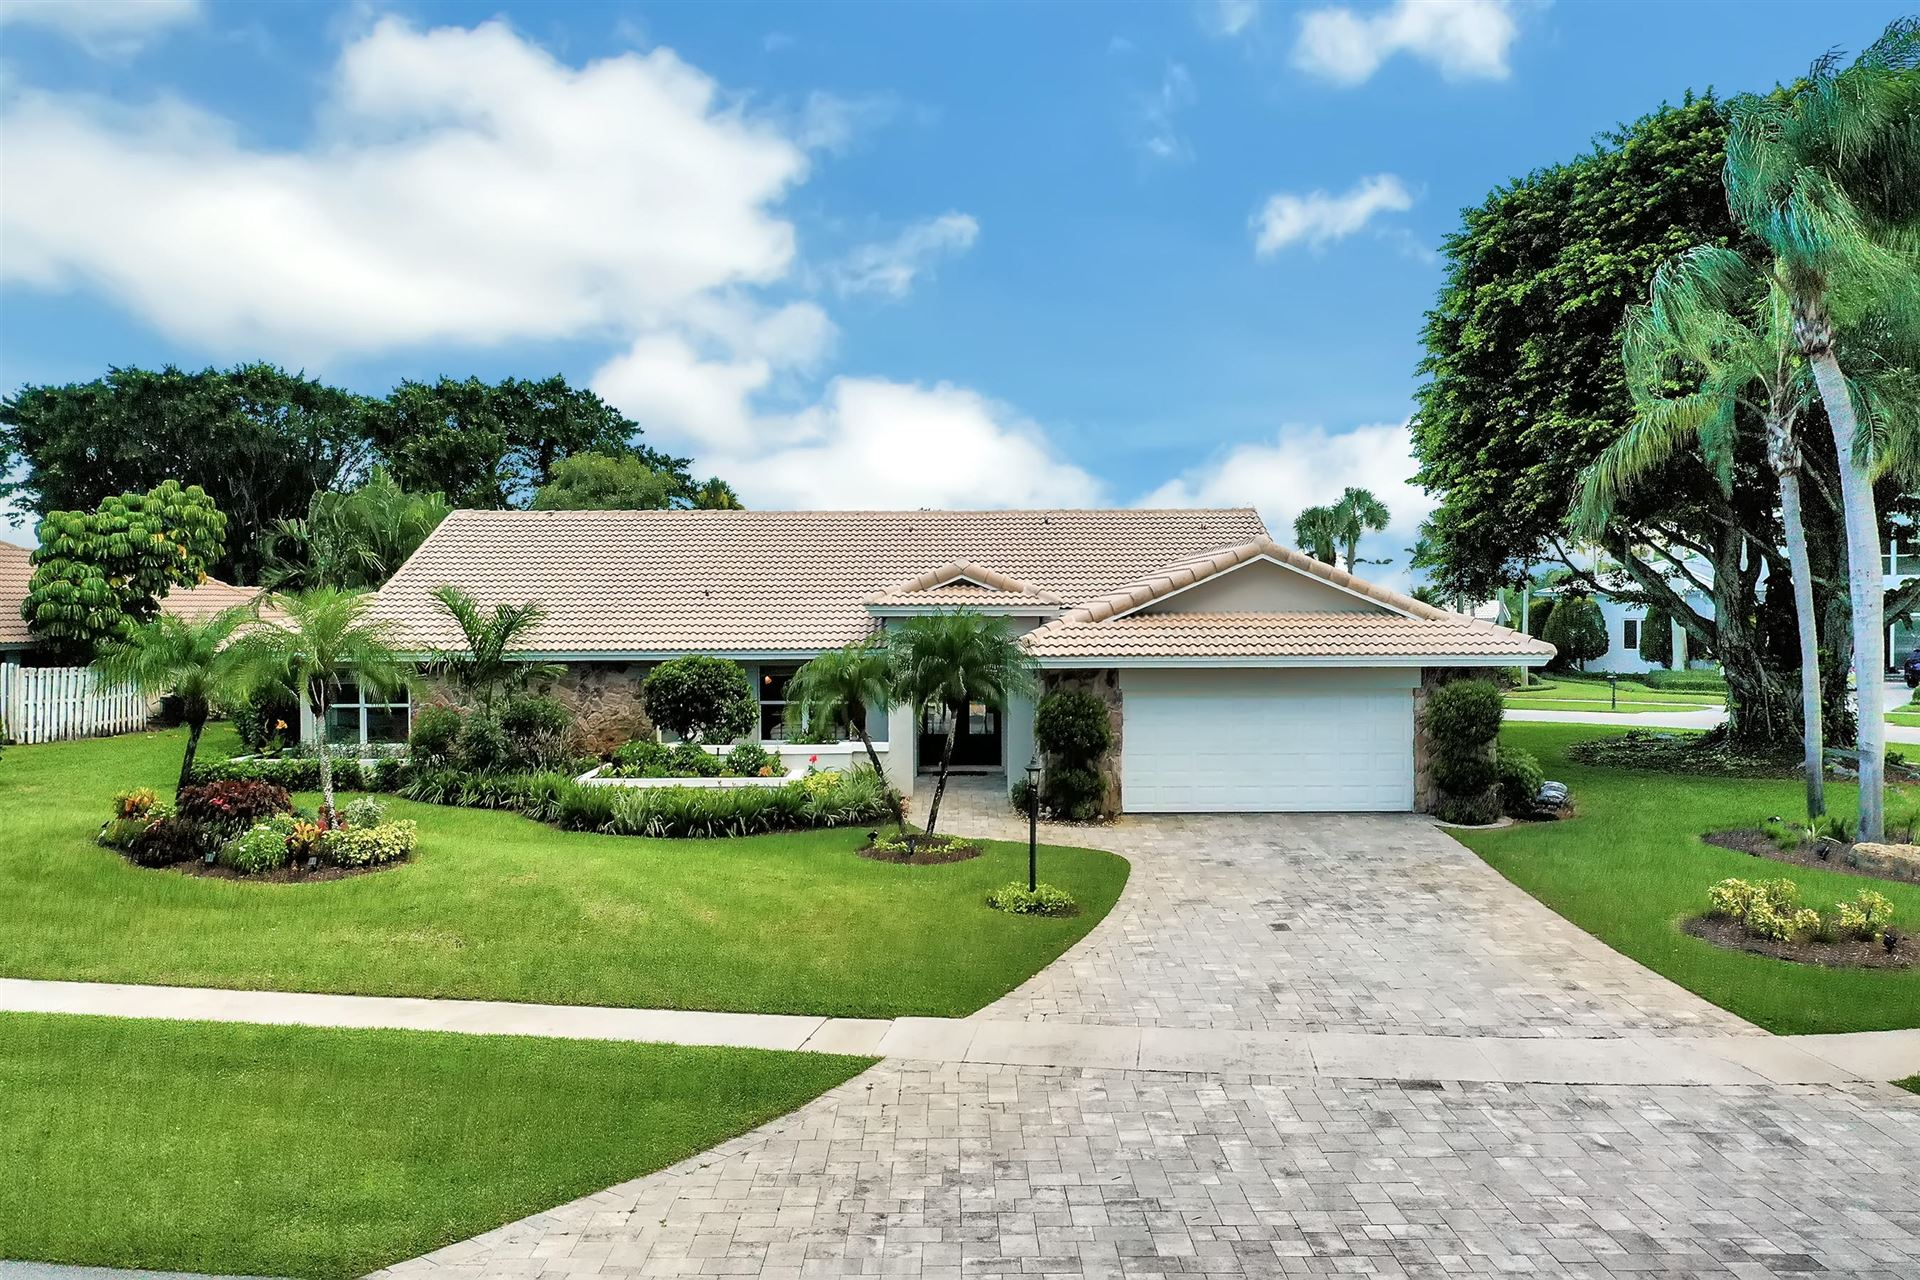 16885 River Birch Circle, Delray Beach, FL 33445 - MLS#: RX-10682073